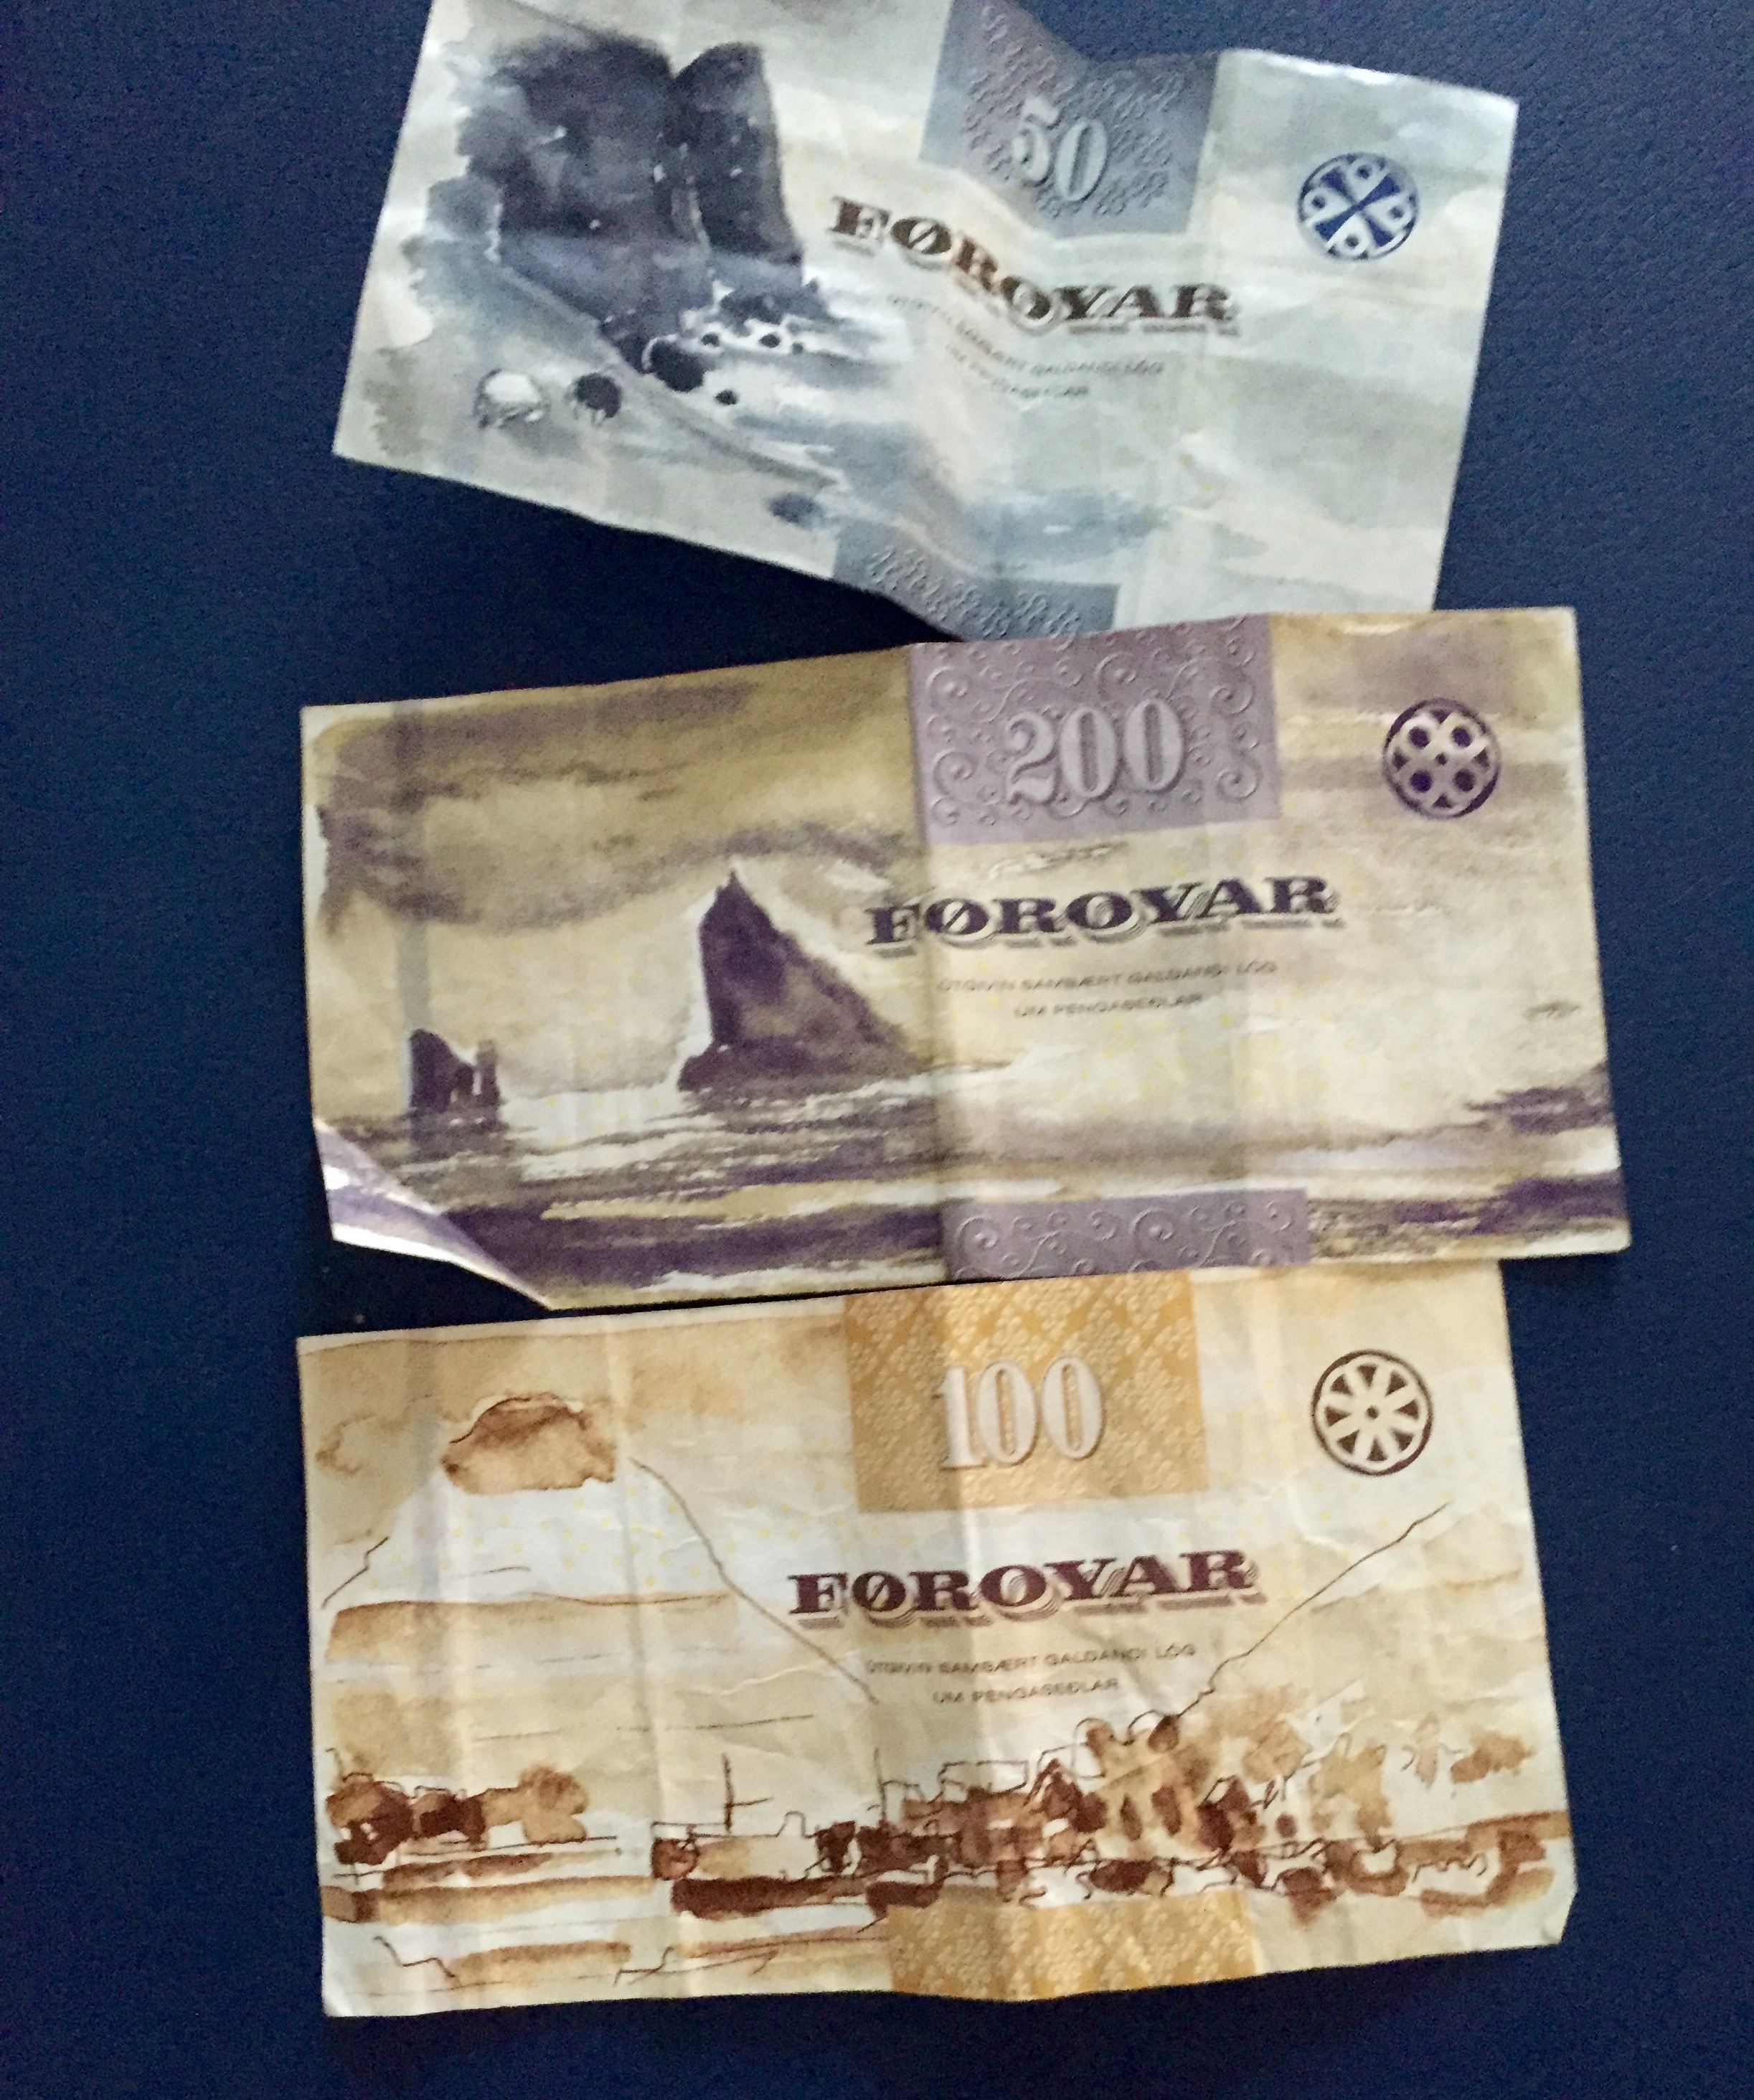 Færøyske sedler med naturmotiver.